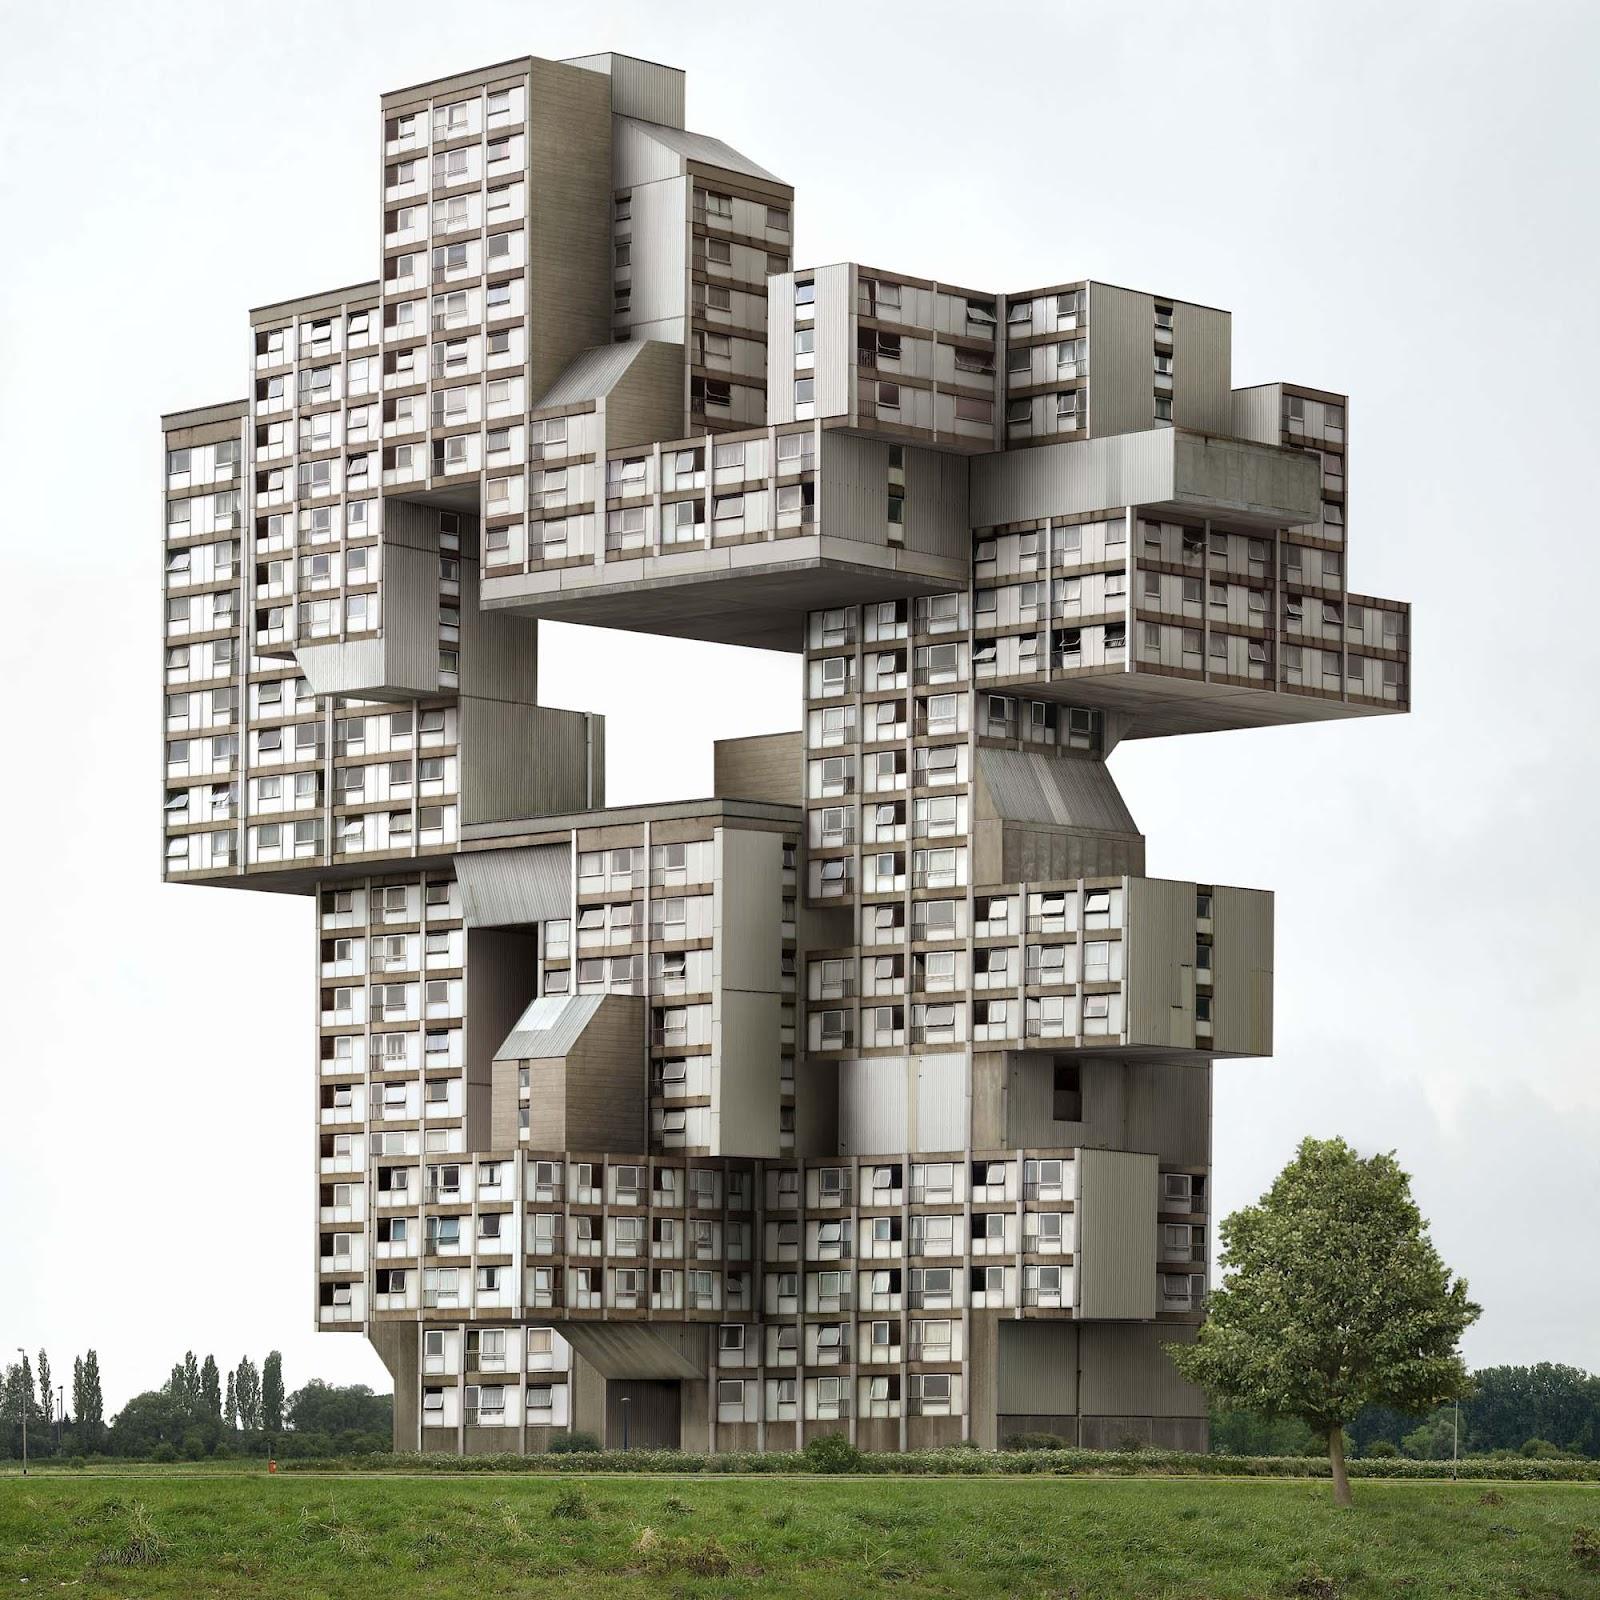 Belgian Surrealism modern design by moderndesignorg